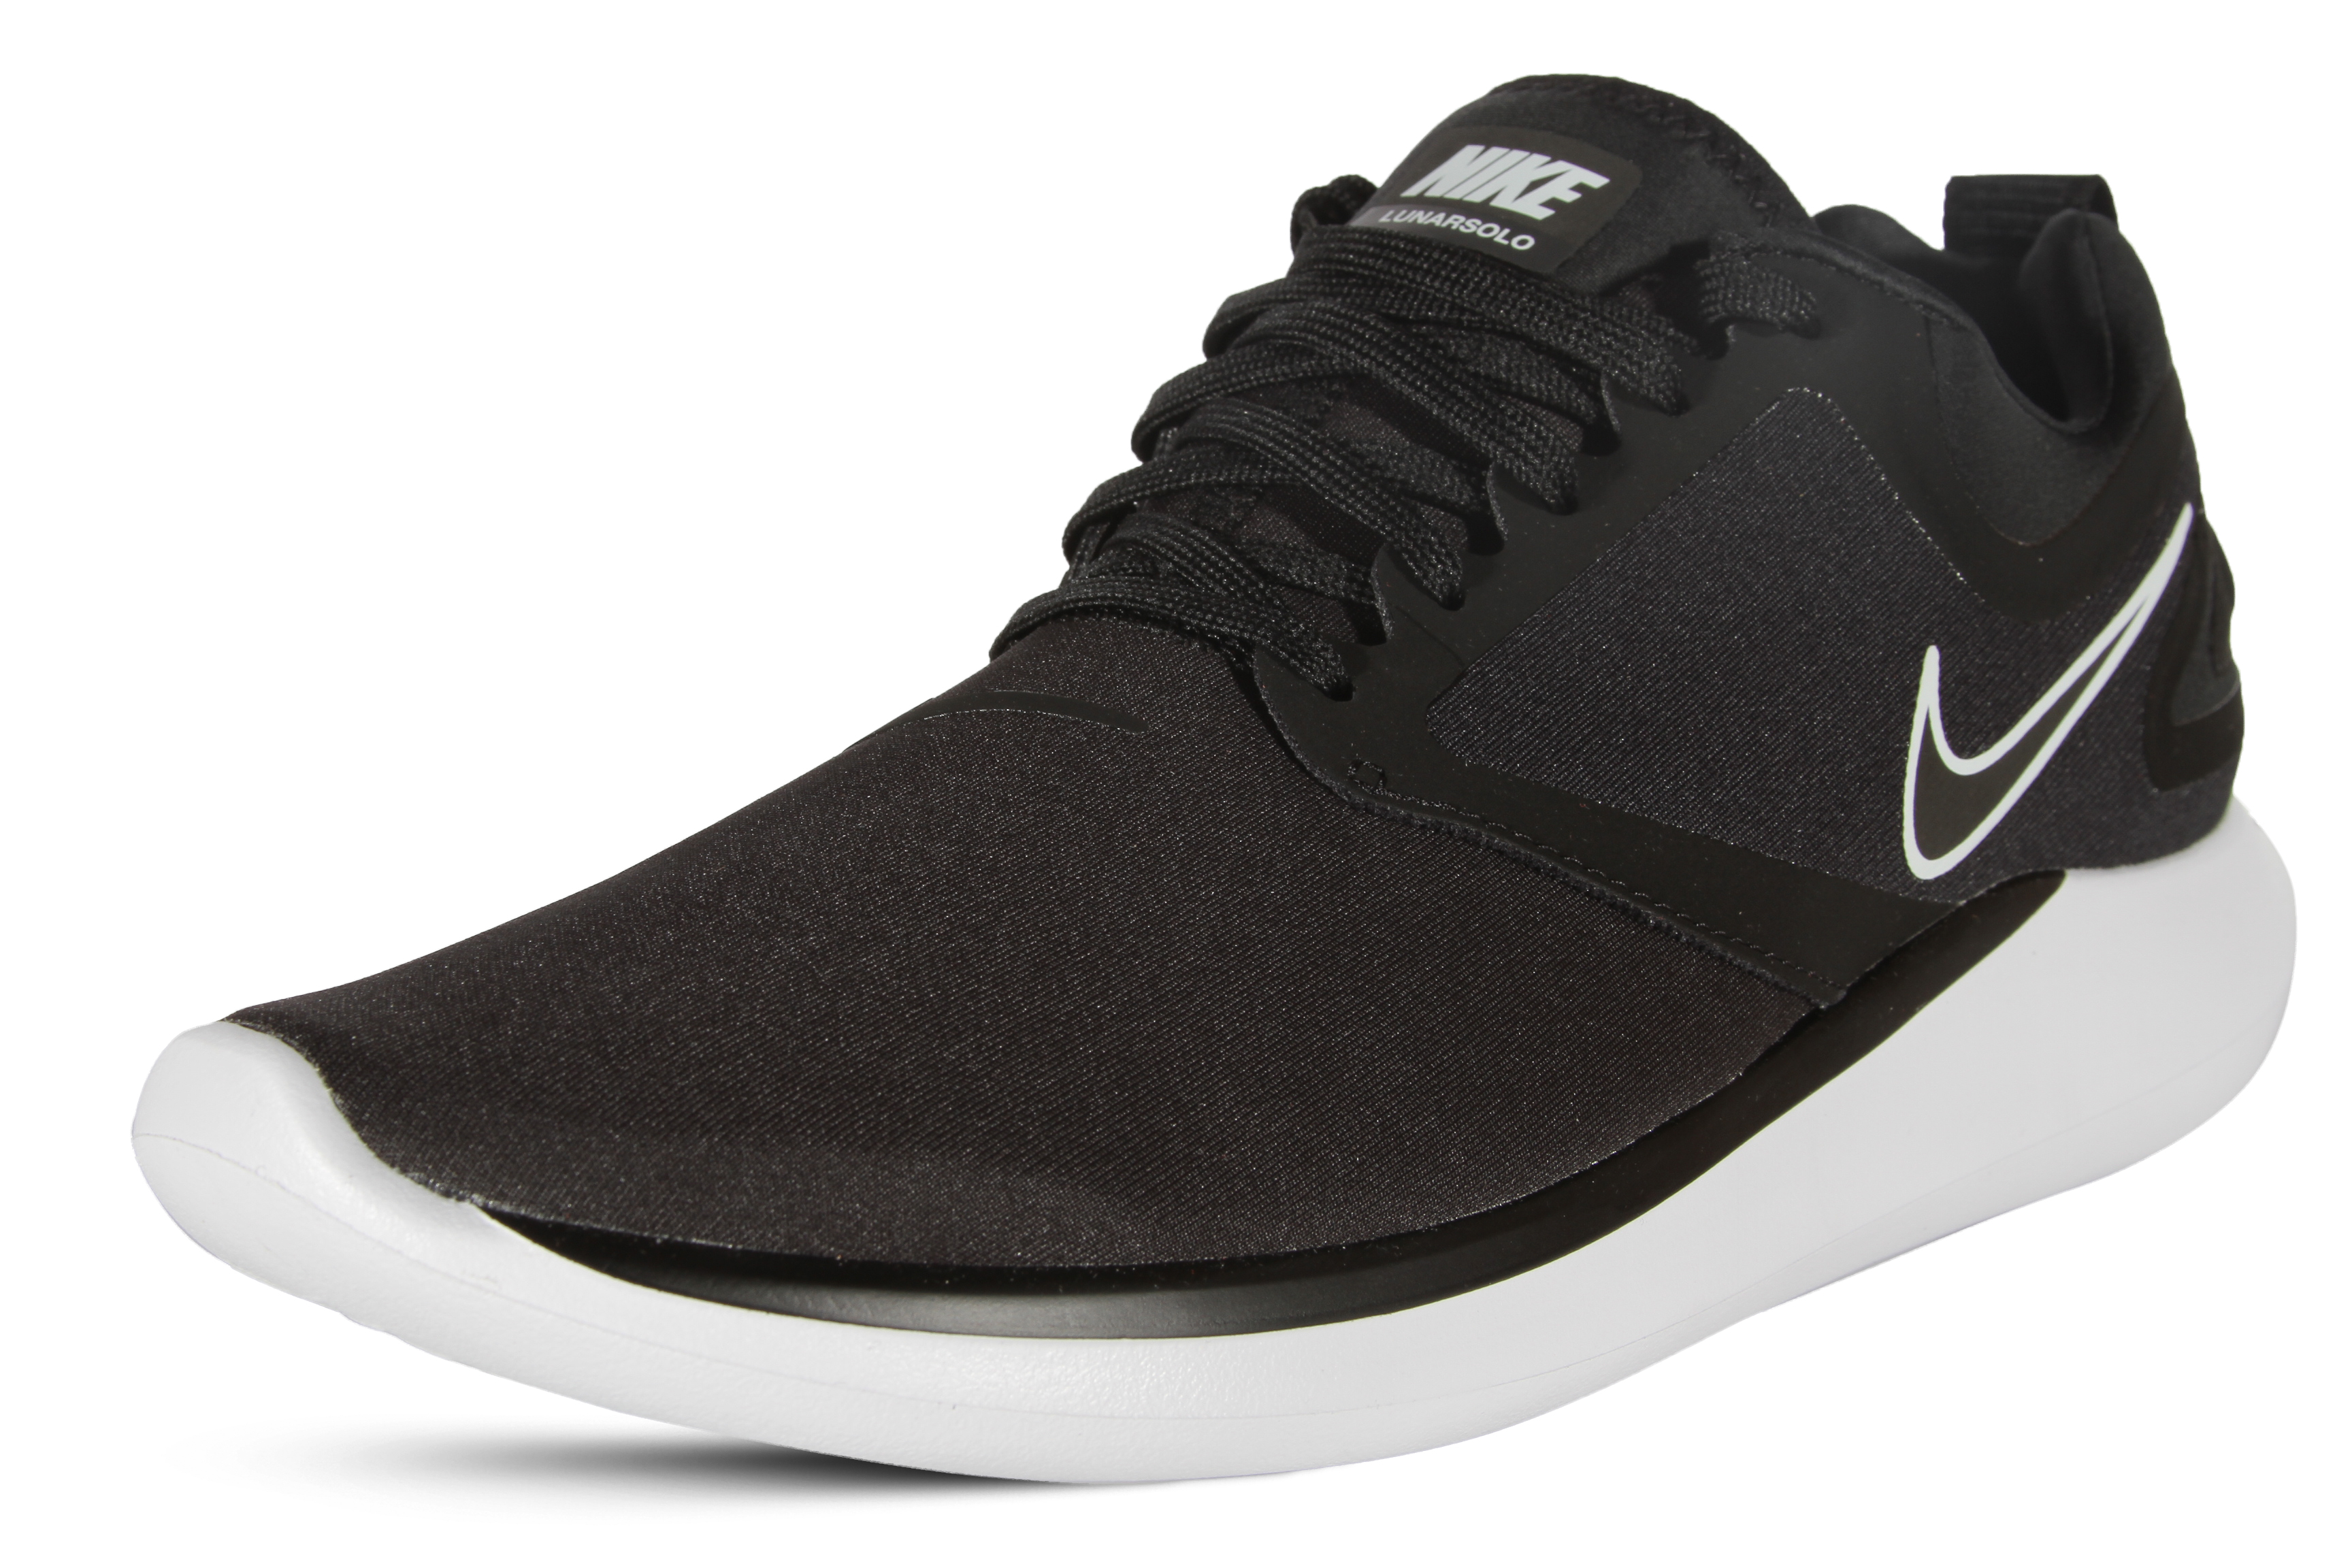 2d88cbd2726 ... Nike Lunarsolo Men s Men s Men s Running Shoes AA4079-001 863fca ...